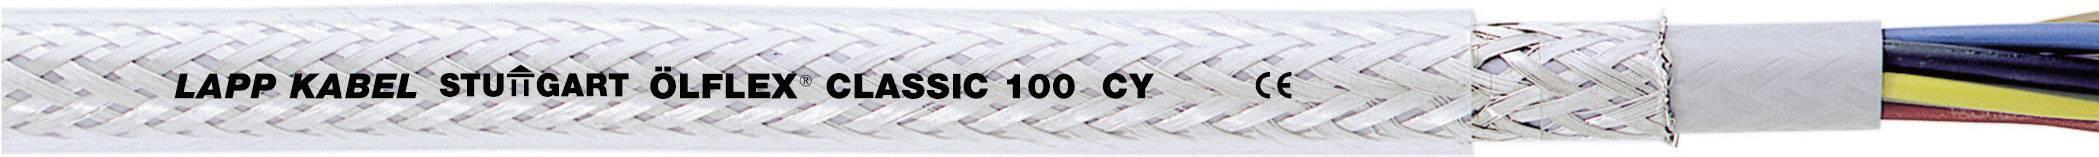 Datový kabel LappKabel Ölflex CLASSIC 100 CY, 3 x 2,5 mm², transparentní, 1 m